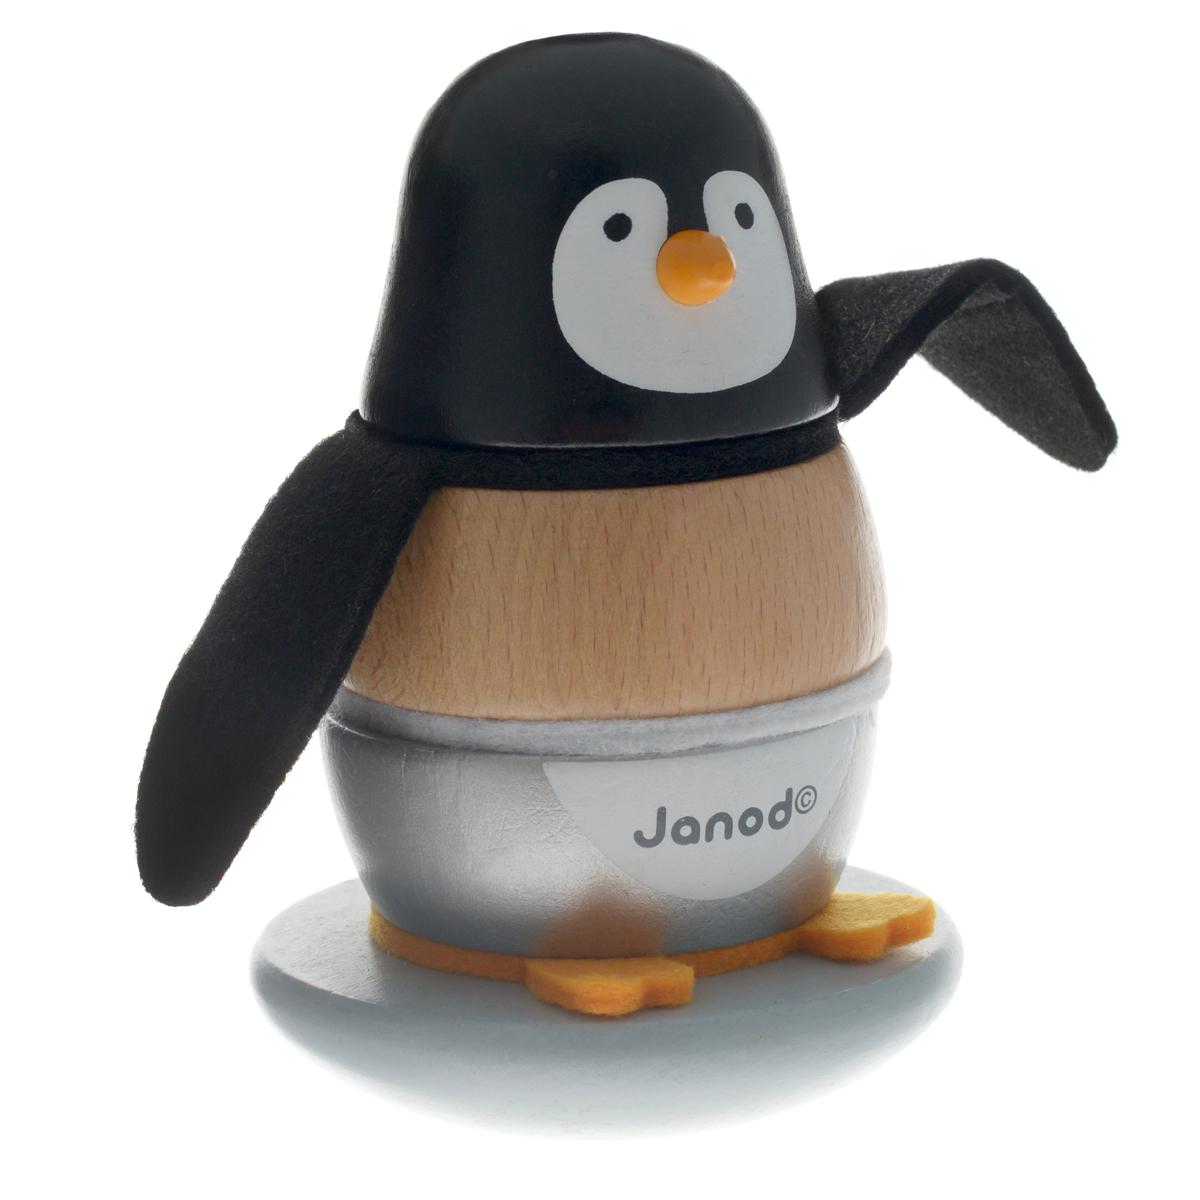 Janod Пирамидка Пингвинчик сортеры janod игрушка пирамидка собачка